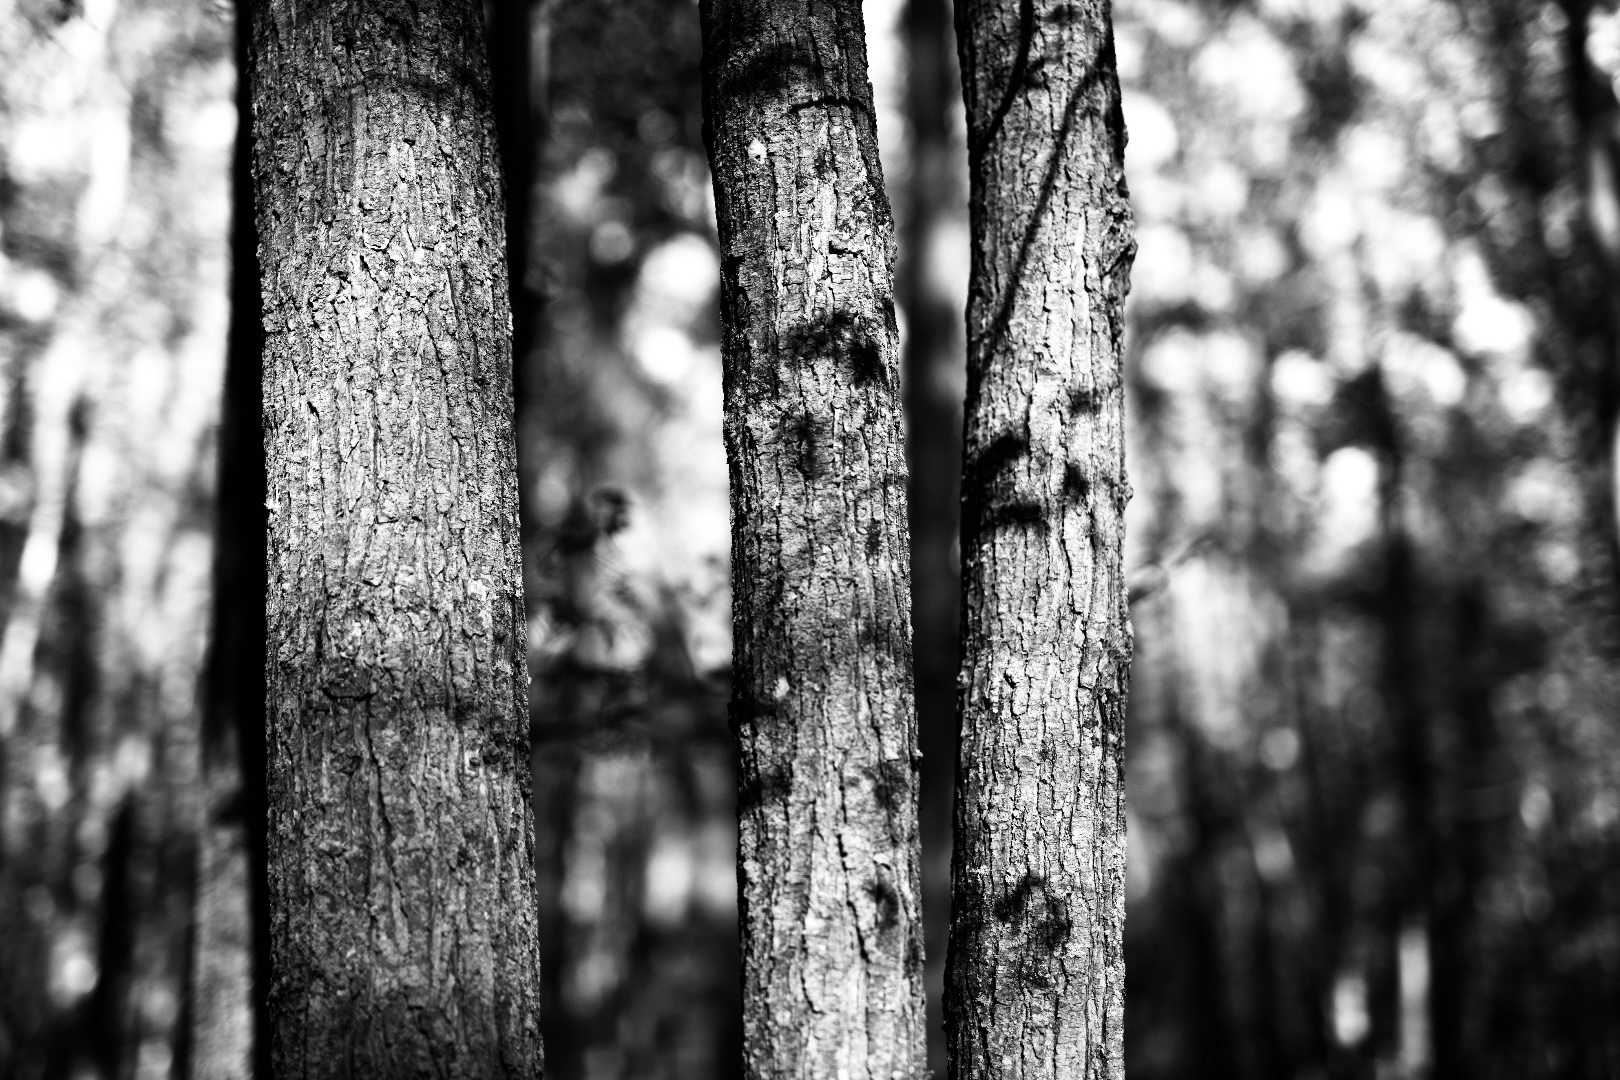 Photography by Taryn Okesson